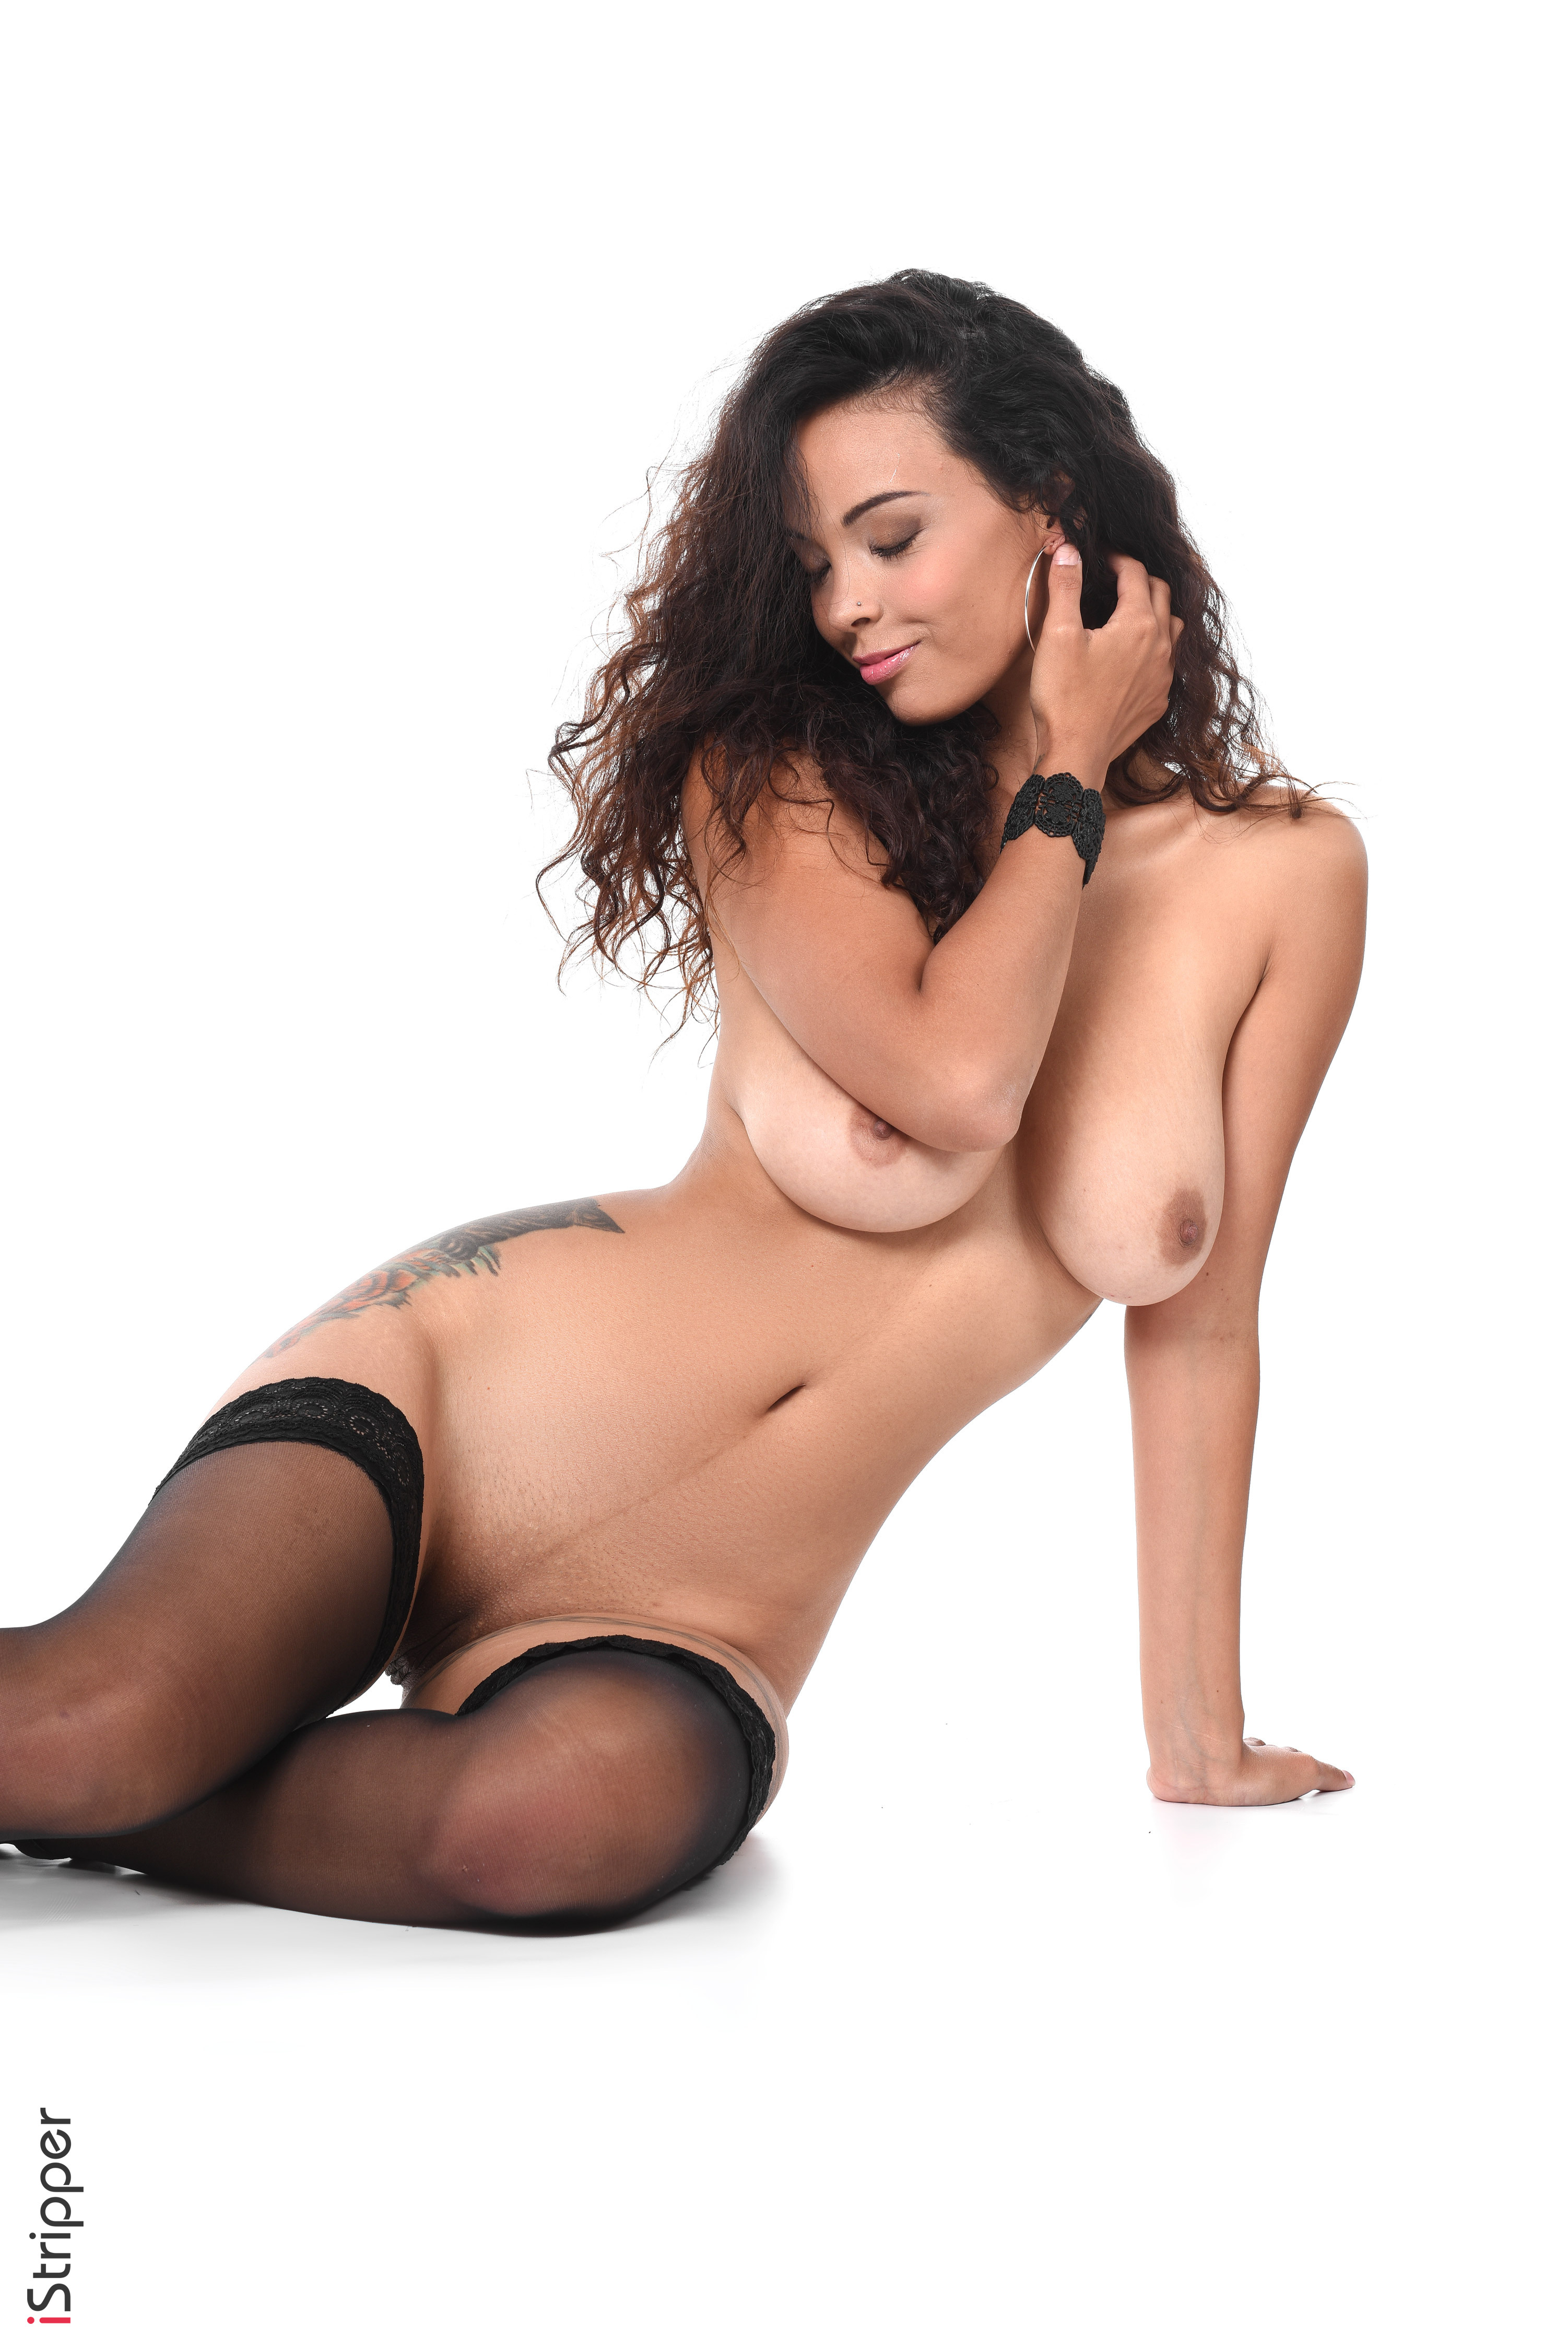 1080p nude wallpaper